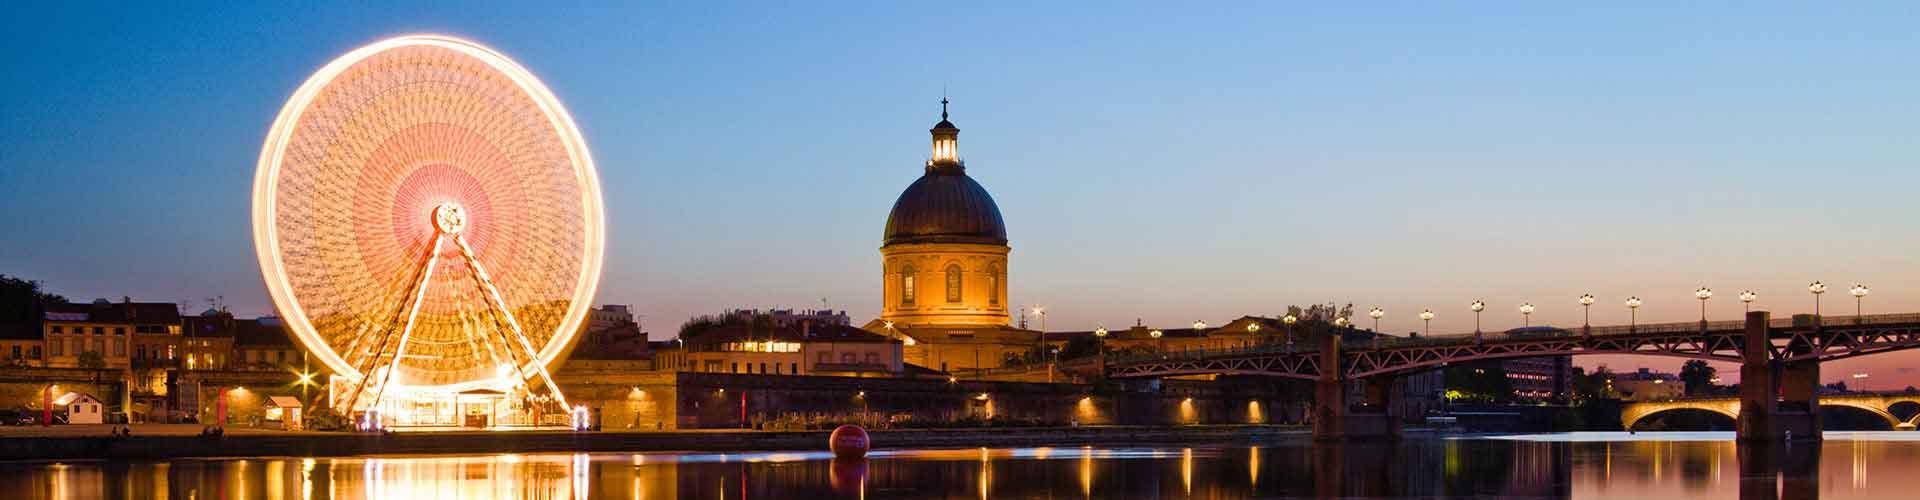 Toulouse - Campamentos en el distrito Daurade. Mapas de Toulouse, Fotos y comentarios de cada Campamento en Toulouse.